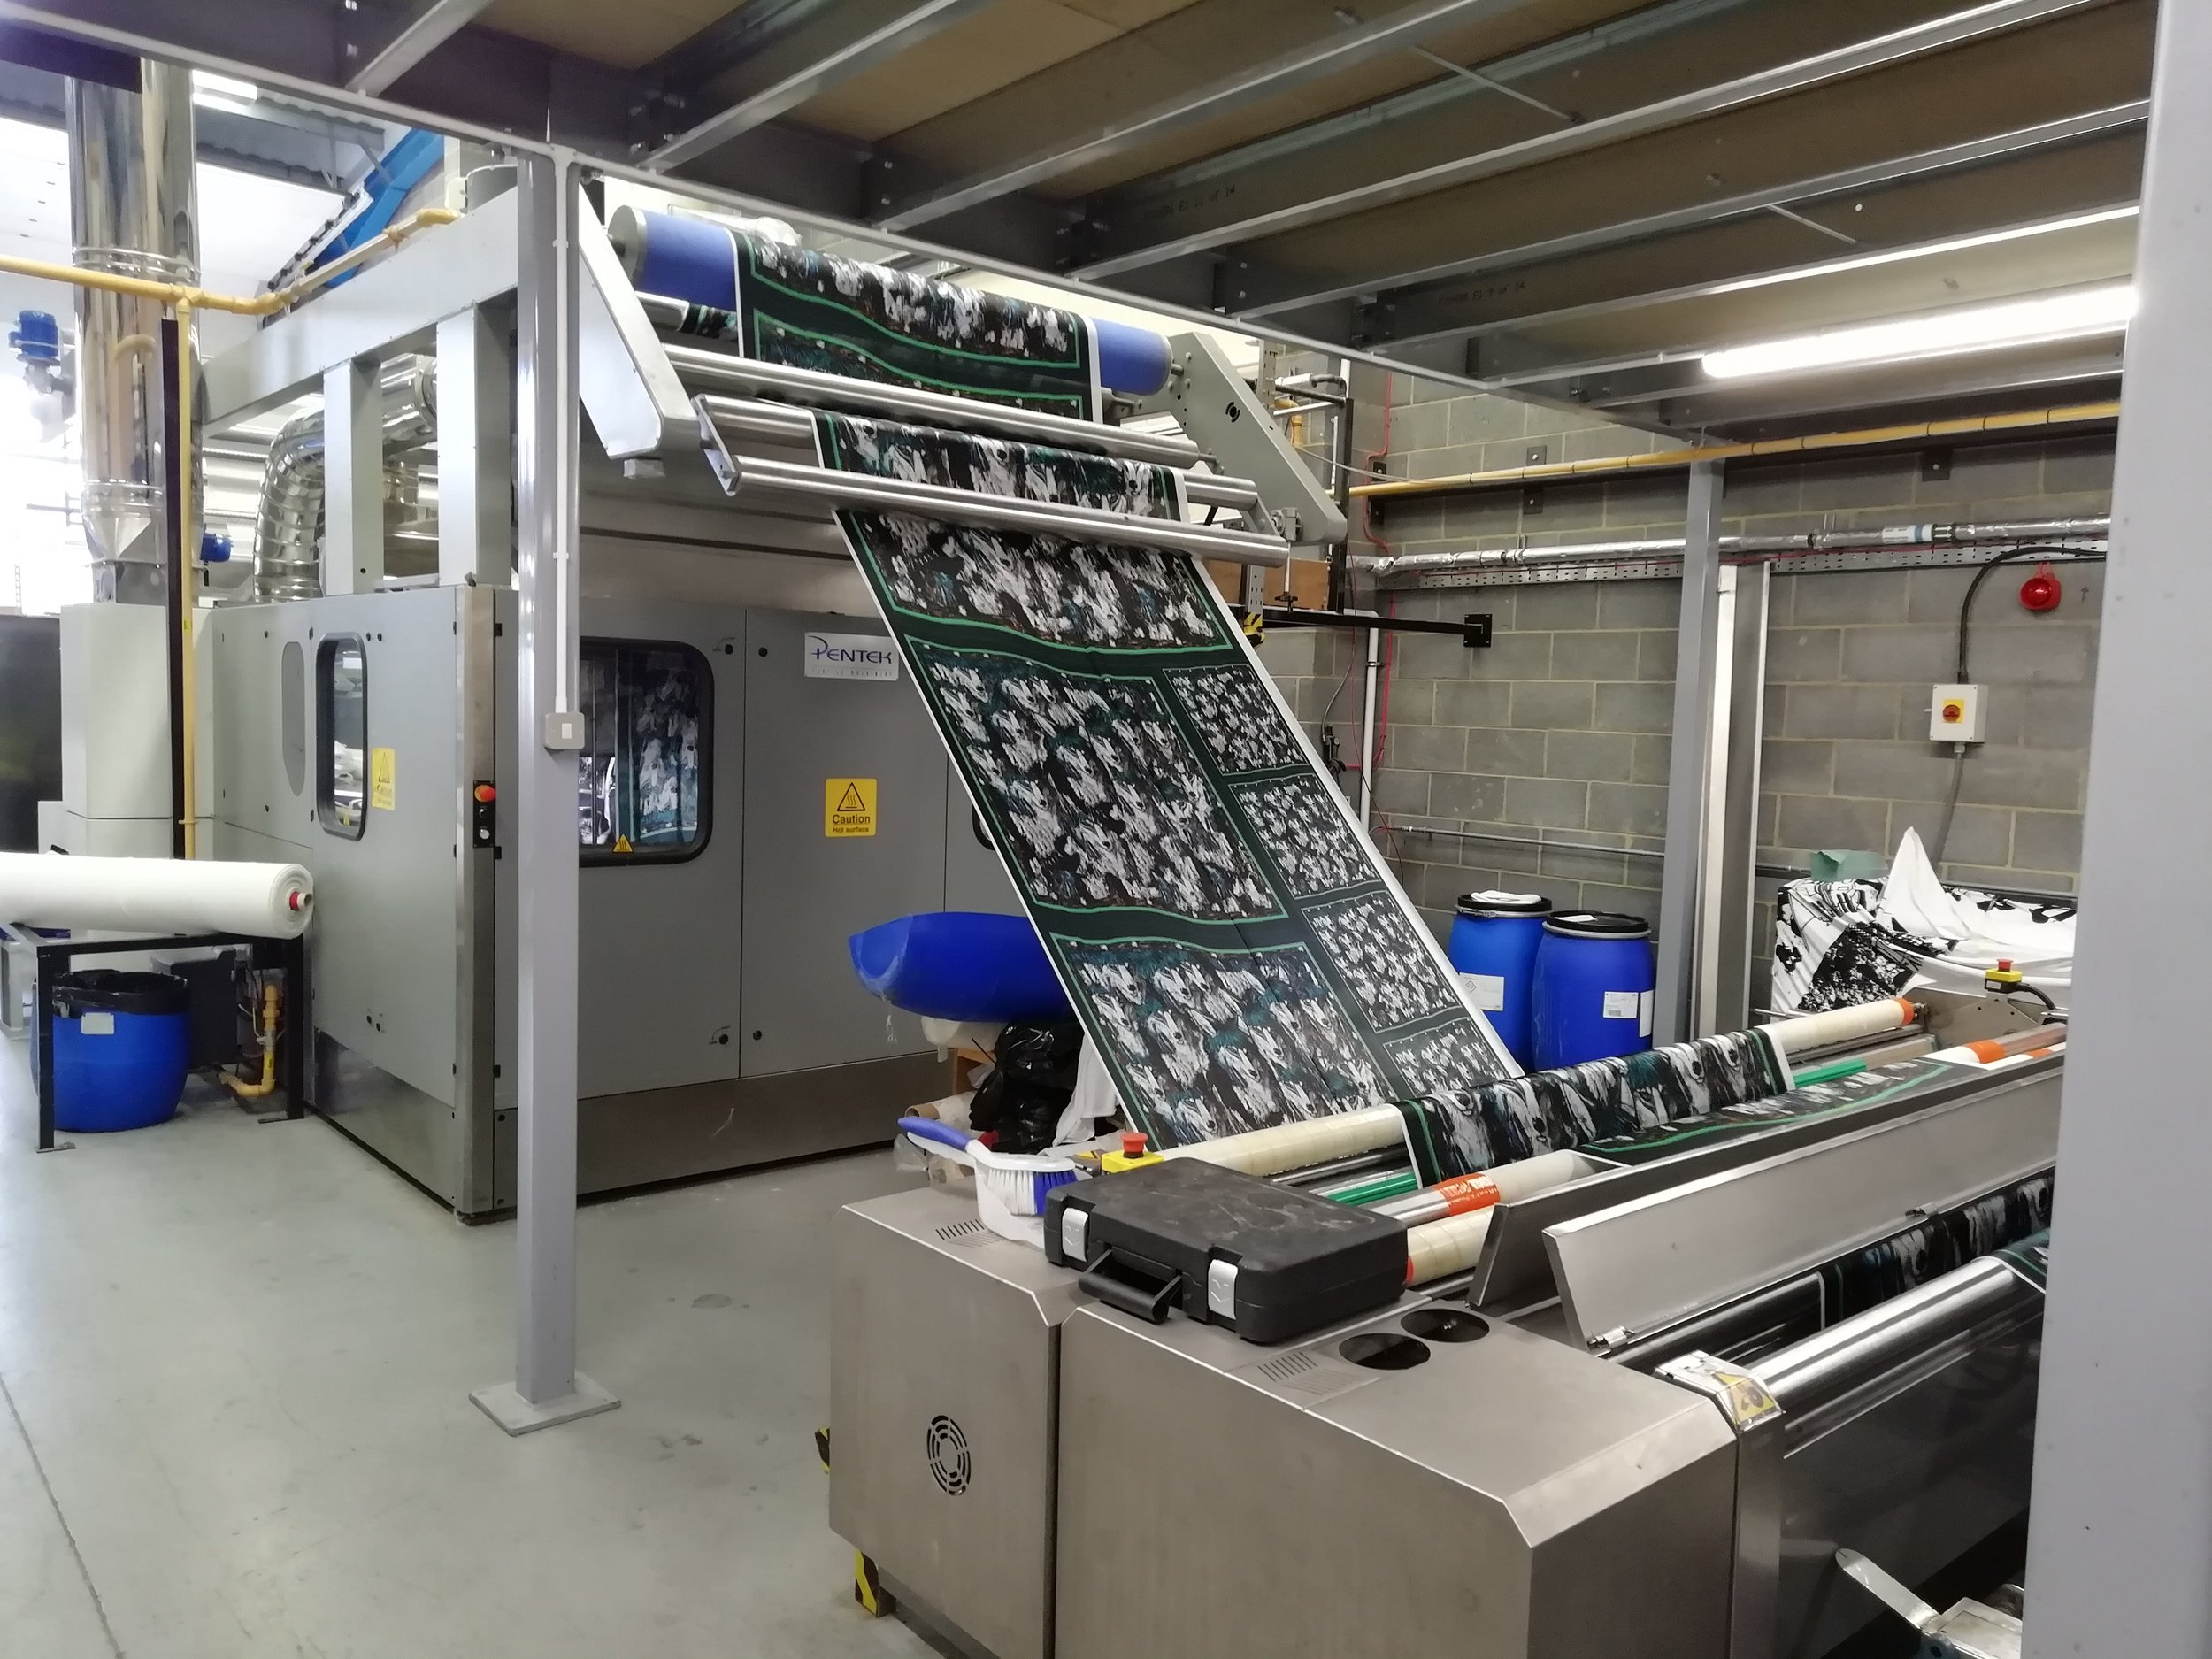 Printint process 6 - debbie millington .jpg